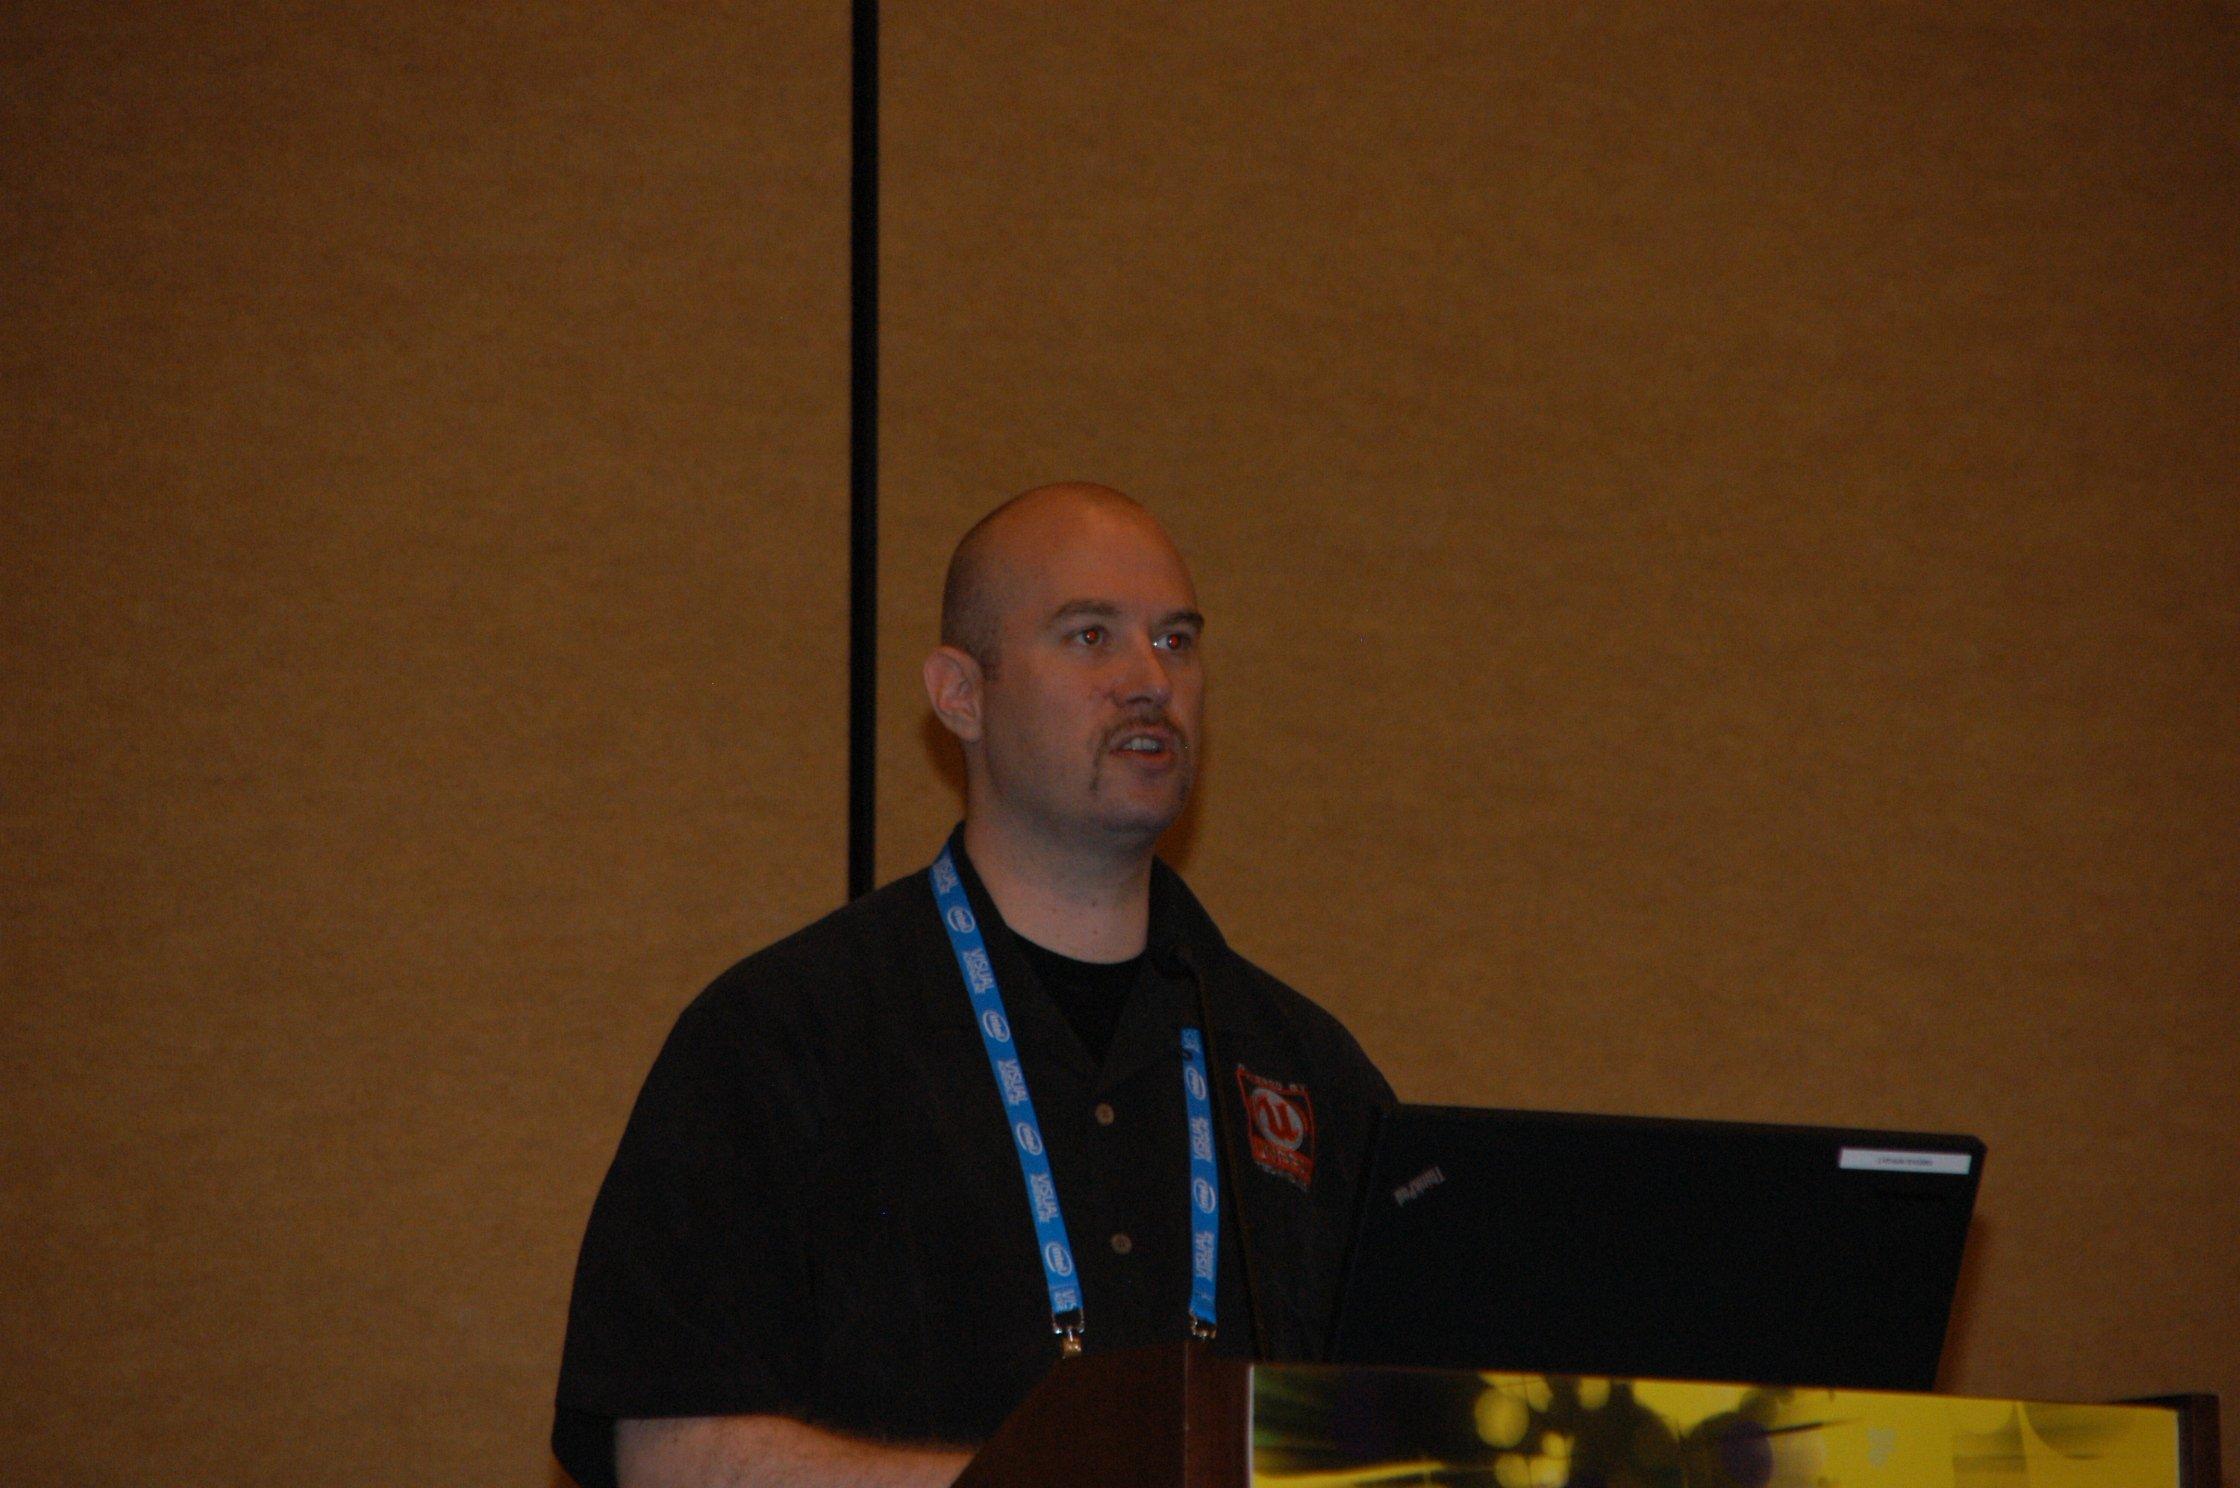 「Gears of War 2」の残虐表現の裏側について語ったNiklas Smedberg氏(Senior Engine Programmer,Epic Games, Inc.)